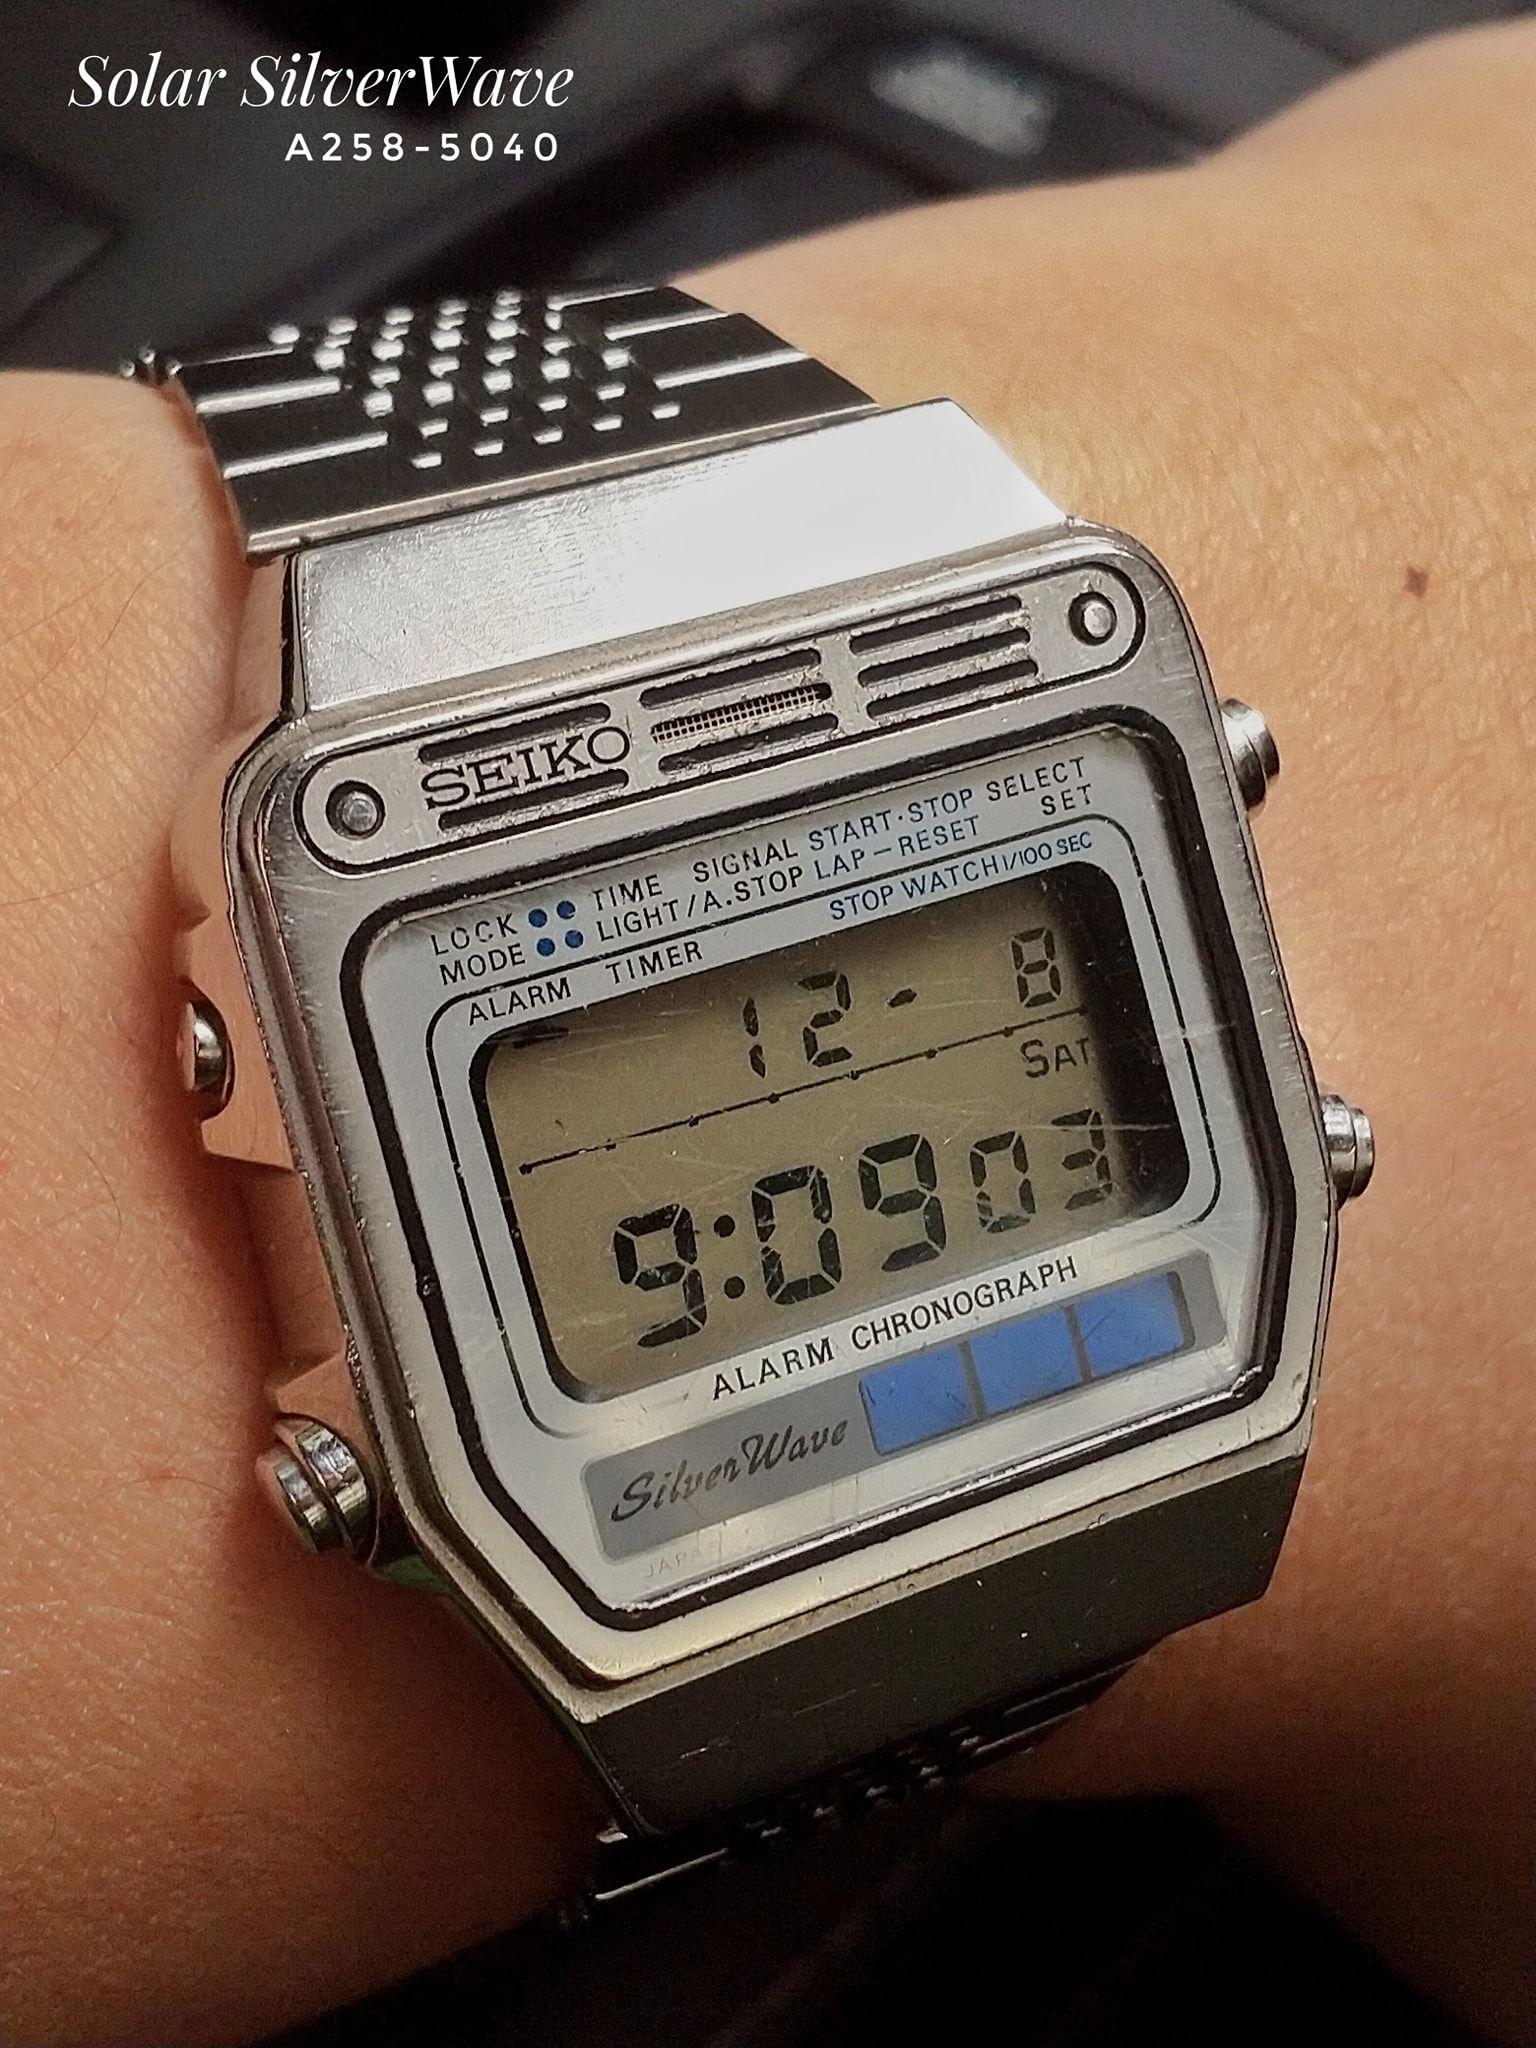 Seiko A258 5040 Coolest Vintage Seiko Digital In 2019 Old